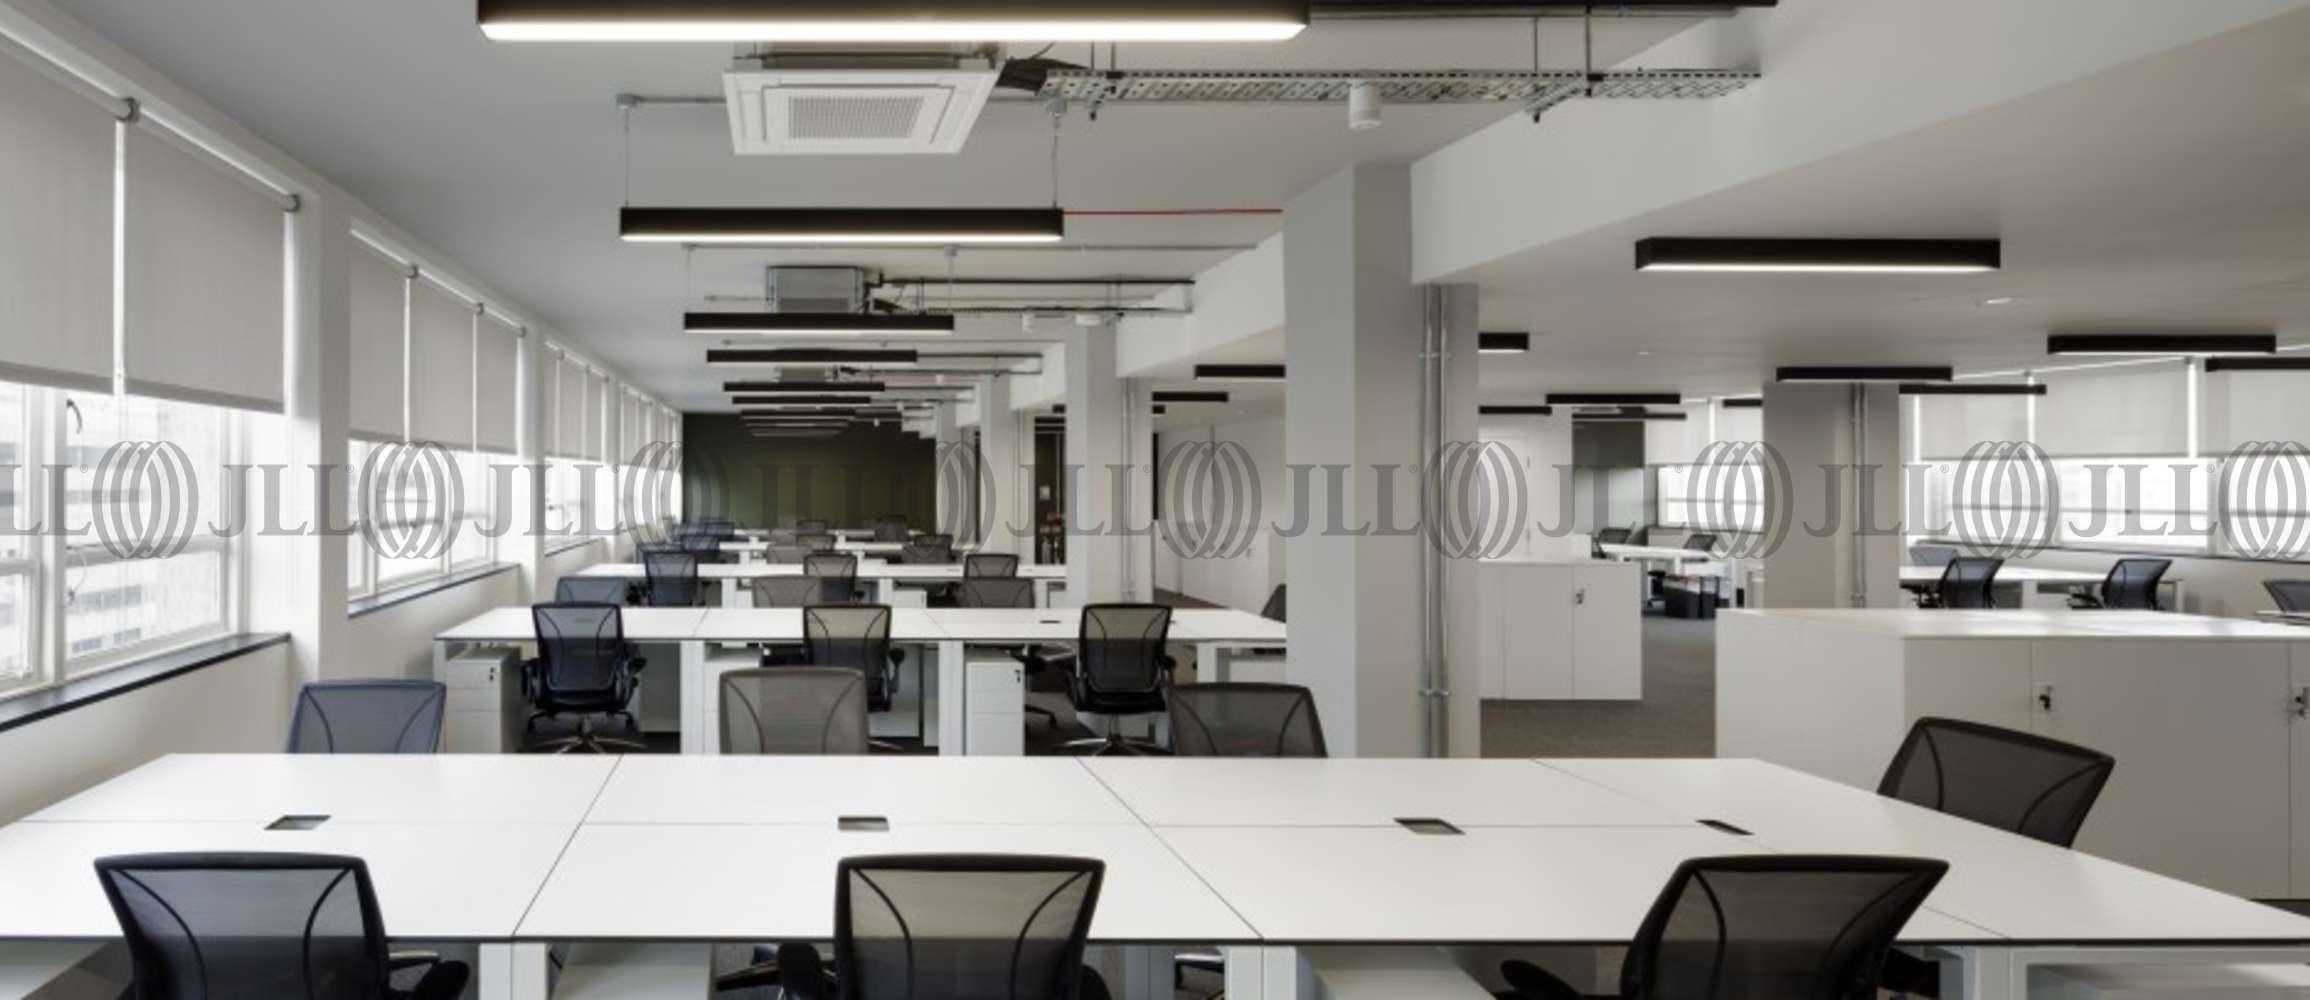 Serviced office London, W1W 7FA - Henry Wood House